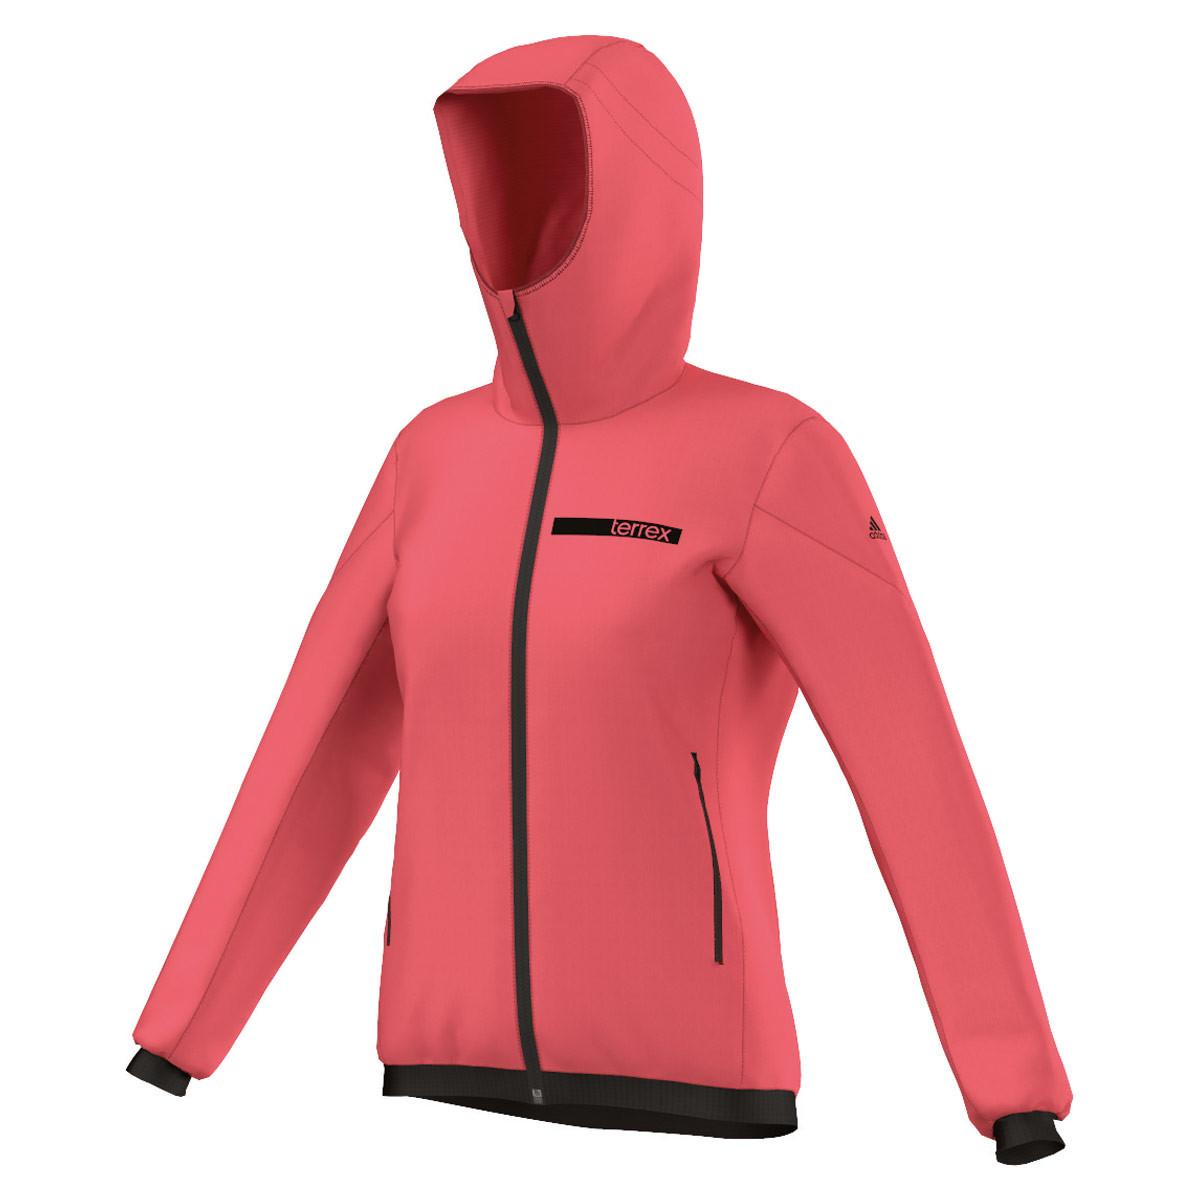 Ndosphere Running Chaquetas Jacket Tx Flex De Para Hooded Adidas Tq0w5OHnxq f0585c391a21f